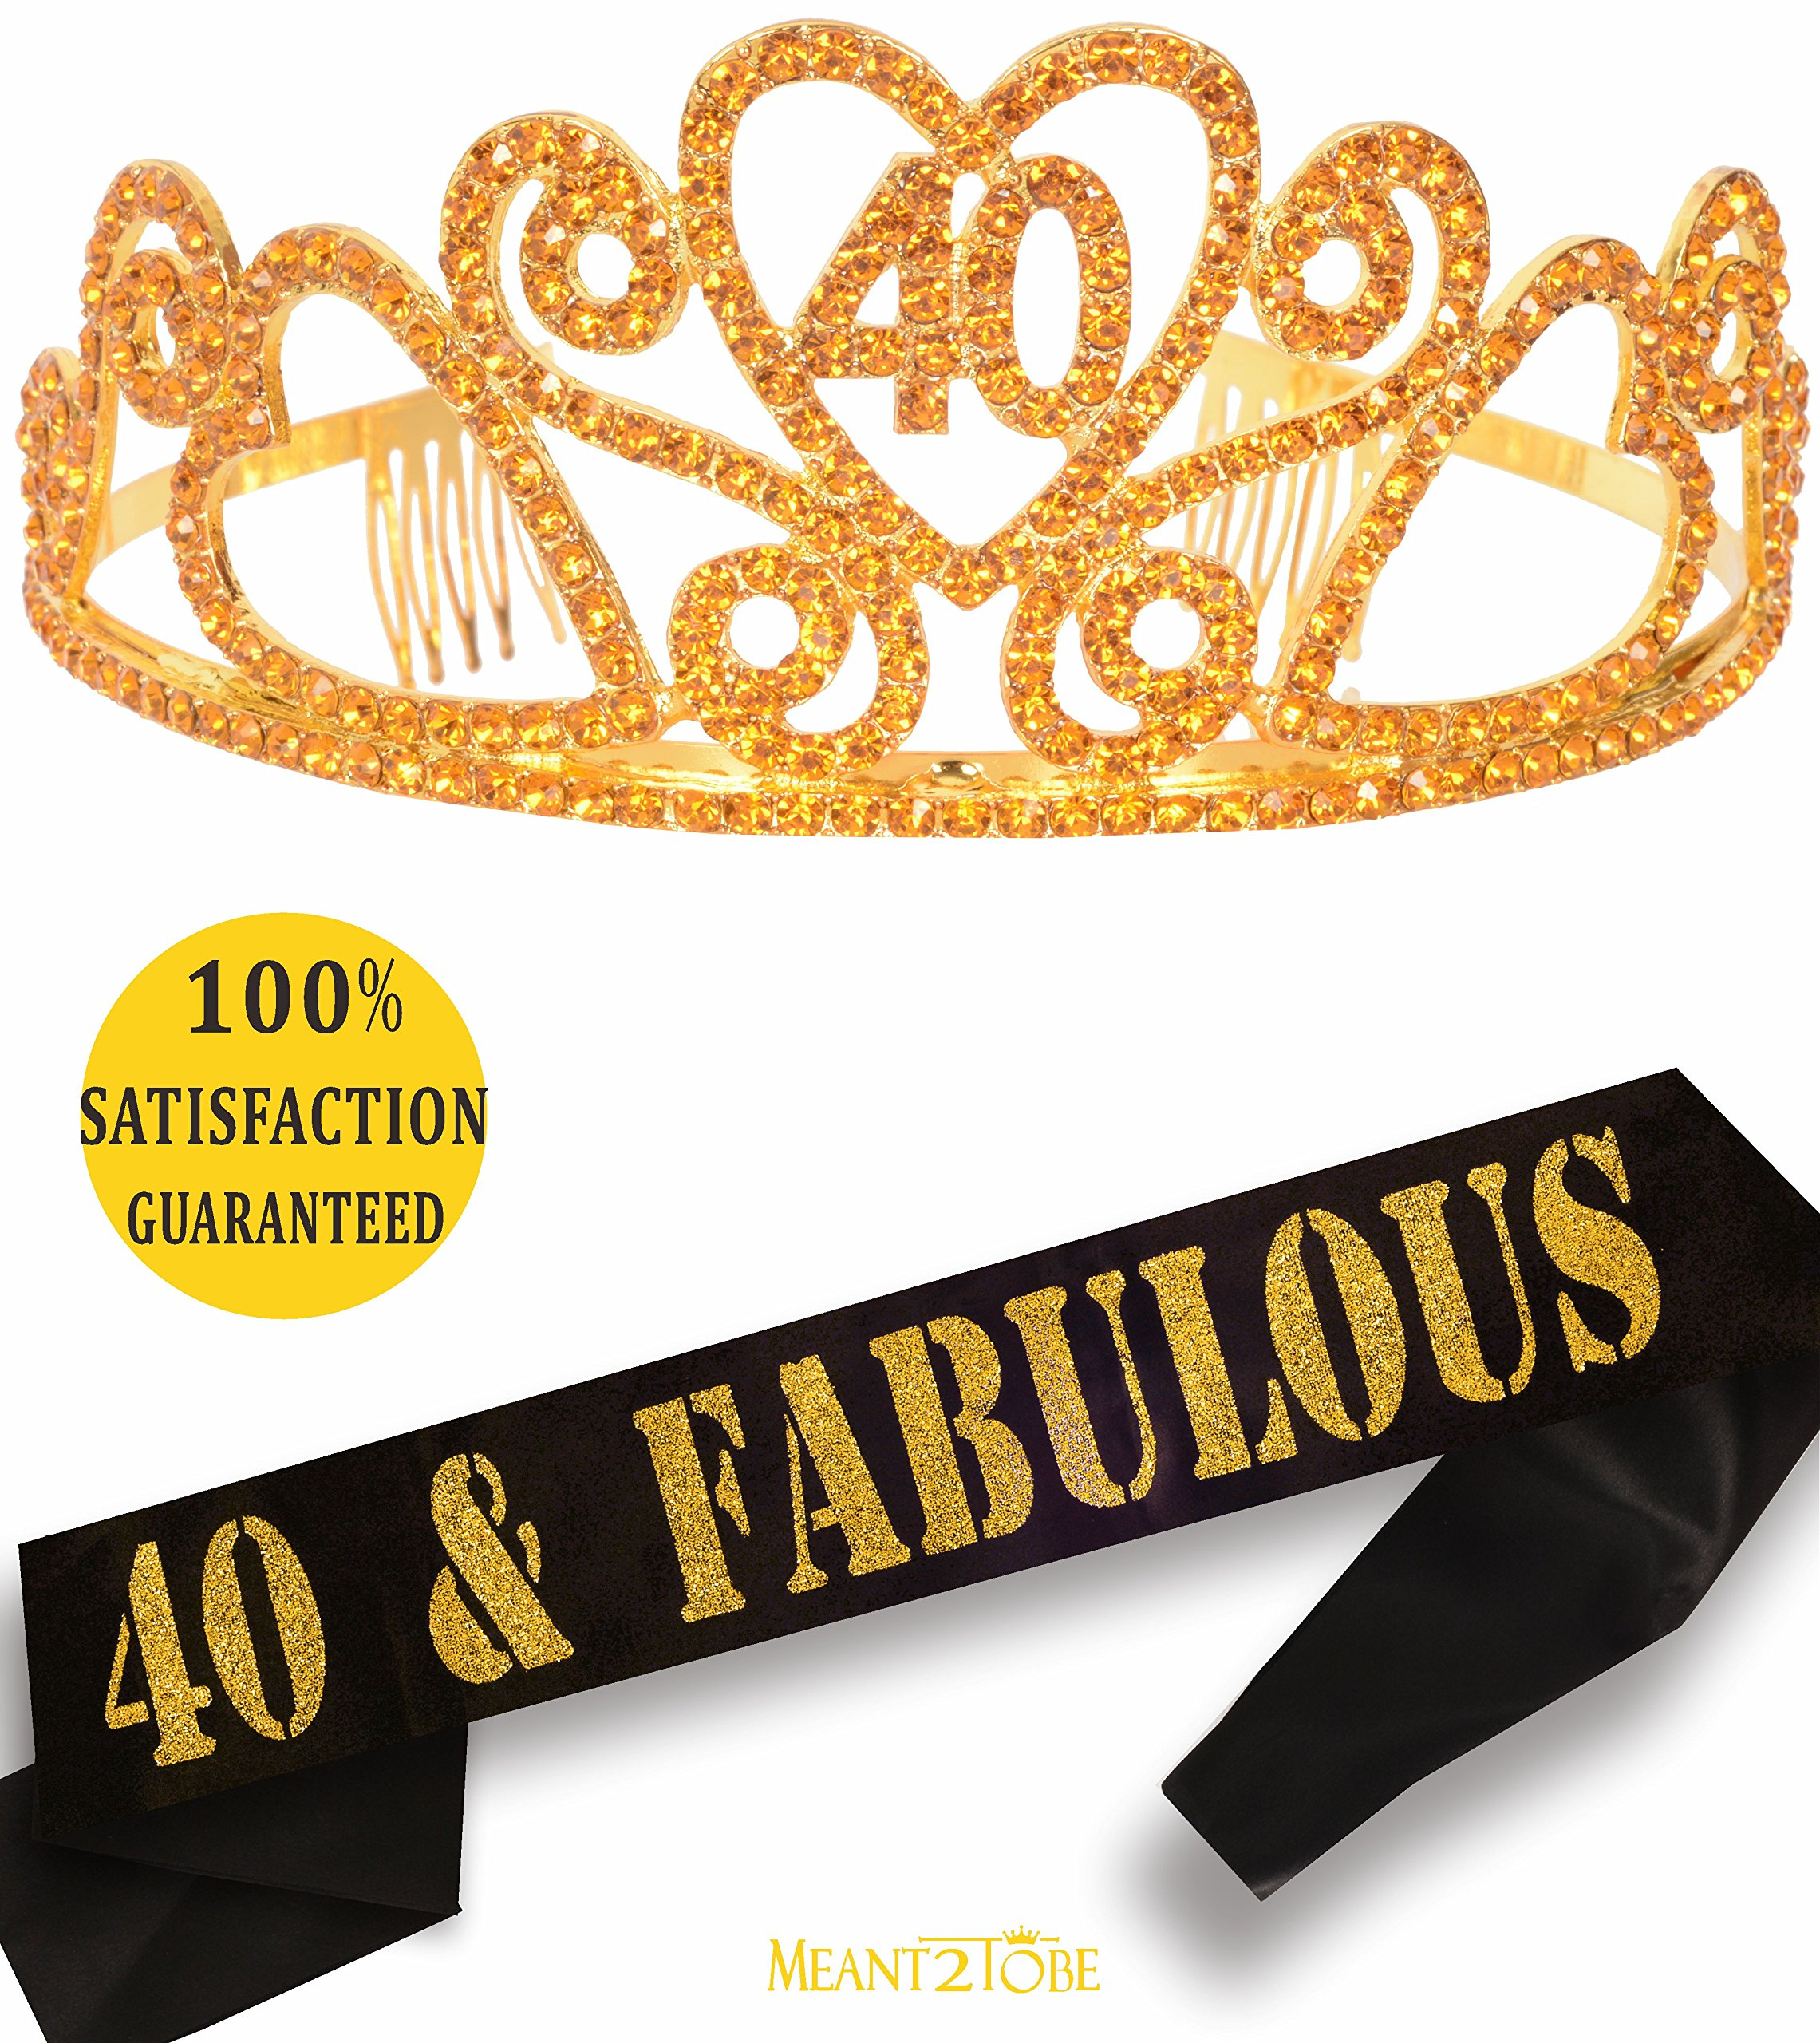 Gold 40th Birthday Tiara and Sash, HAPPY 40th Birthday Party Supplies, 40 & Fabulous Gold Black Glitter Satin Sash and Crystal Tiara Birthday Crown for 40th Birthday Party Sup (Gold Tiara + Gold Sash)